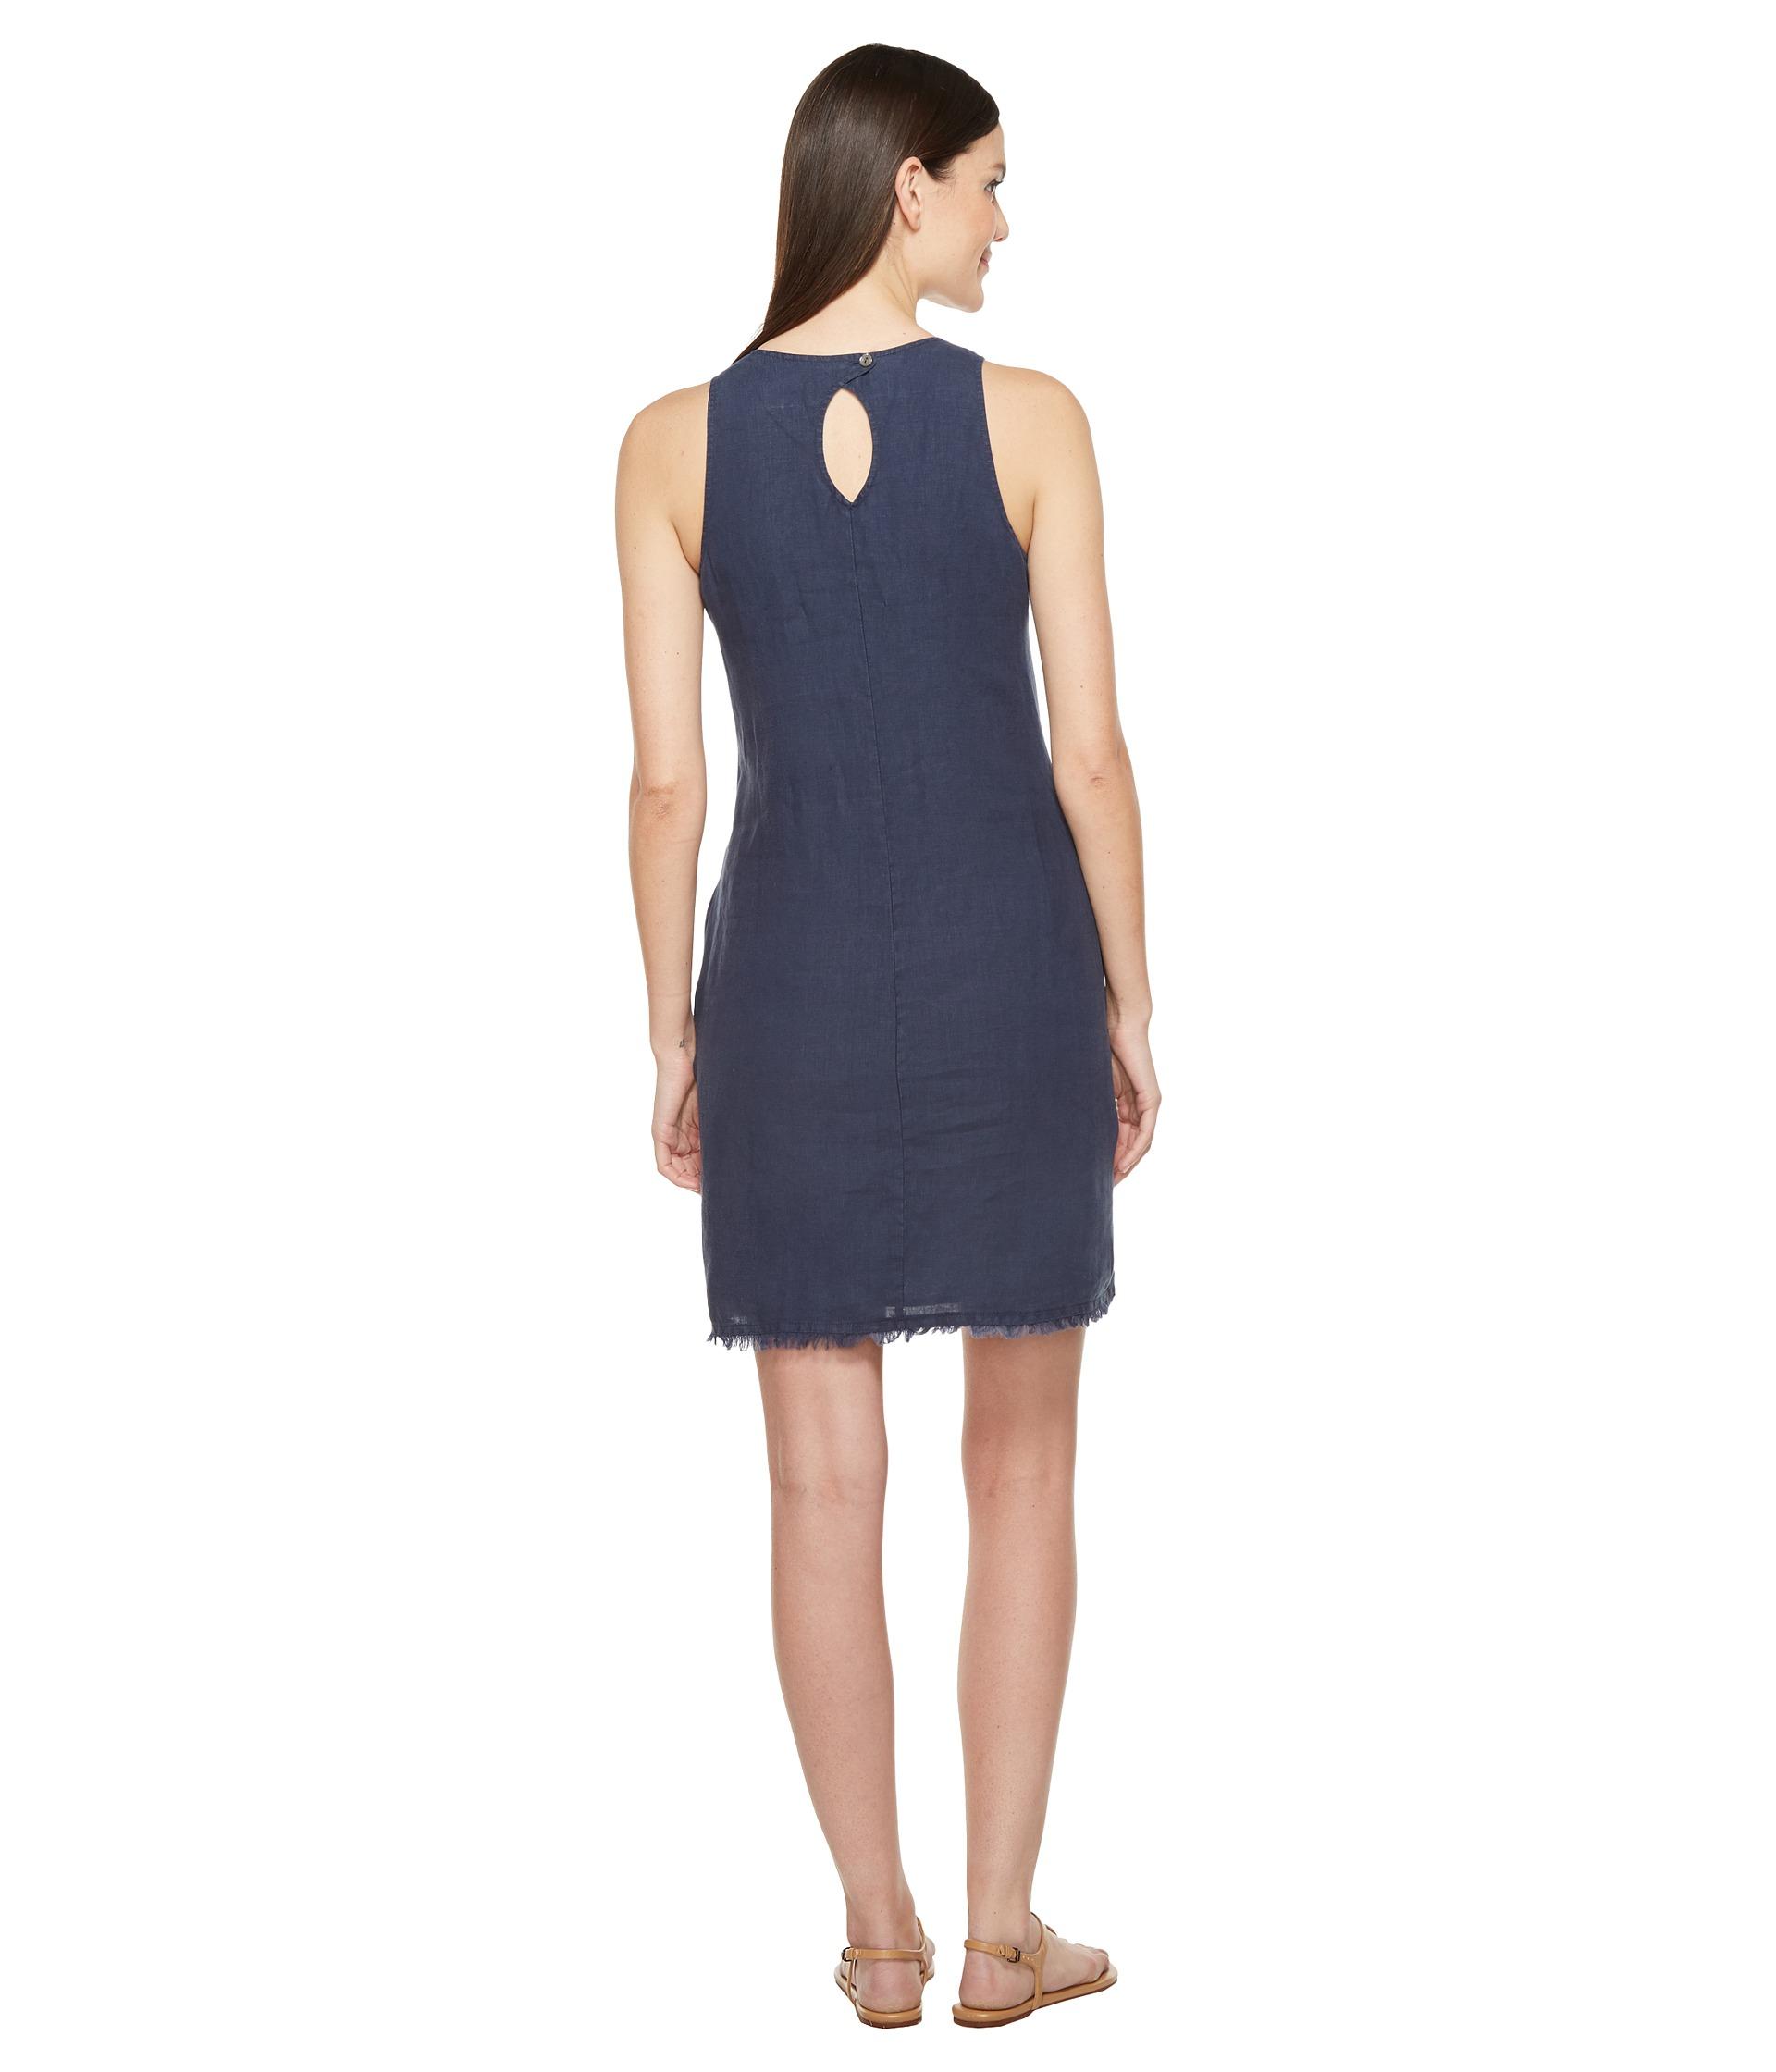 Tommy Bahama Two Palms Sleeveless Short Dress At Zappos Com